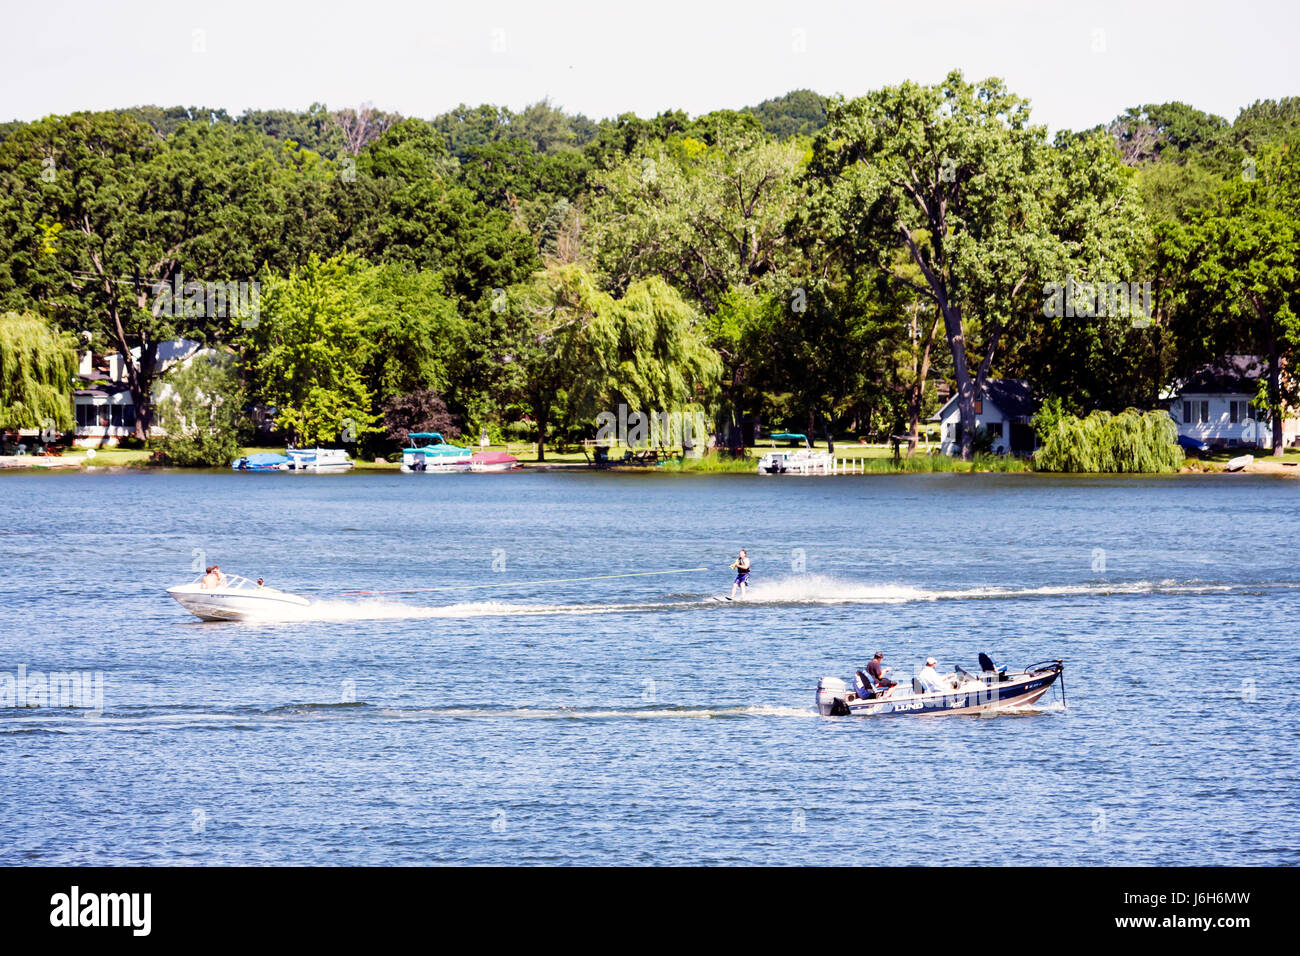 Wisconsin Kenosha Paddock Lake Old Settlers Park motor boat water skiing skier sport recreation speed fun fish - Stock Image